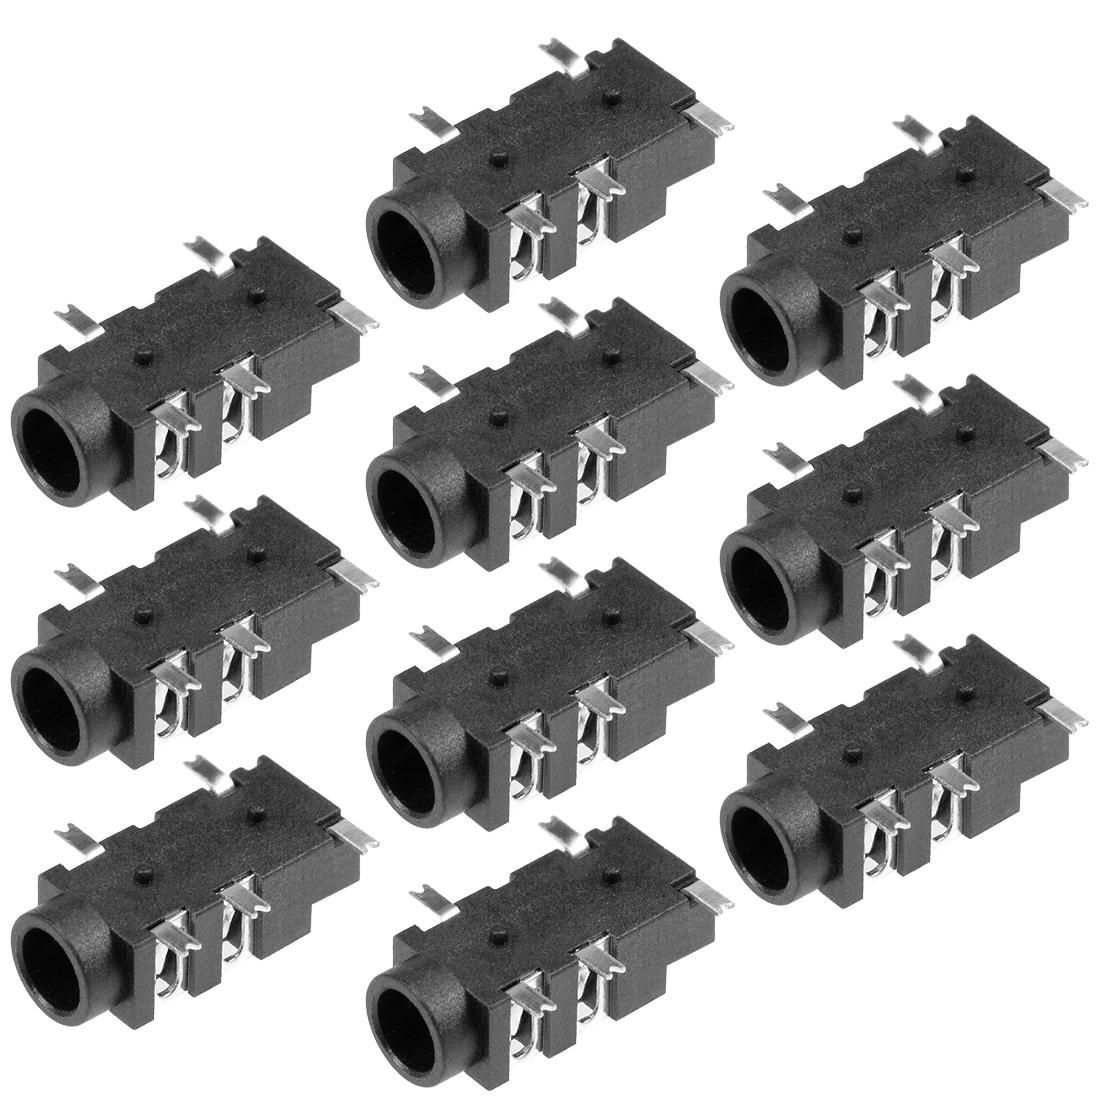 PCB Mount 3.5mm 5 Pin Socket Headphone Stereo Video Connector Black PJ327A 10Pcs